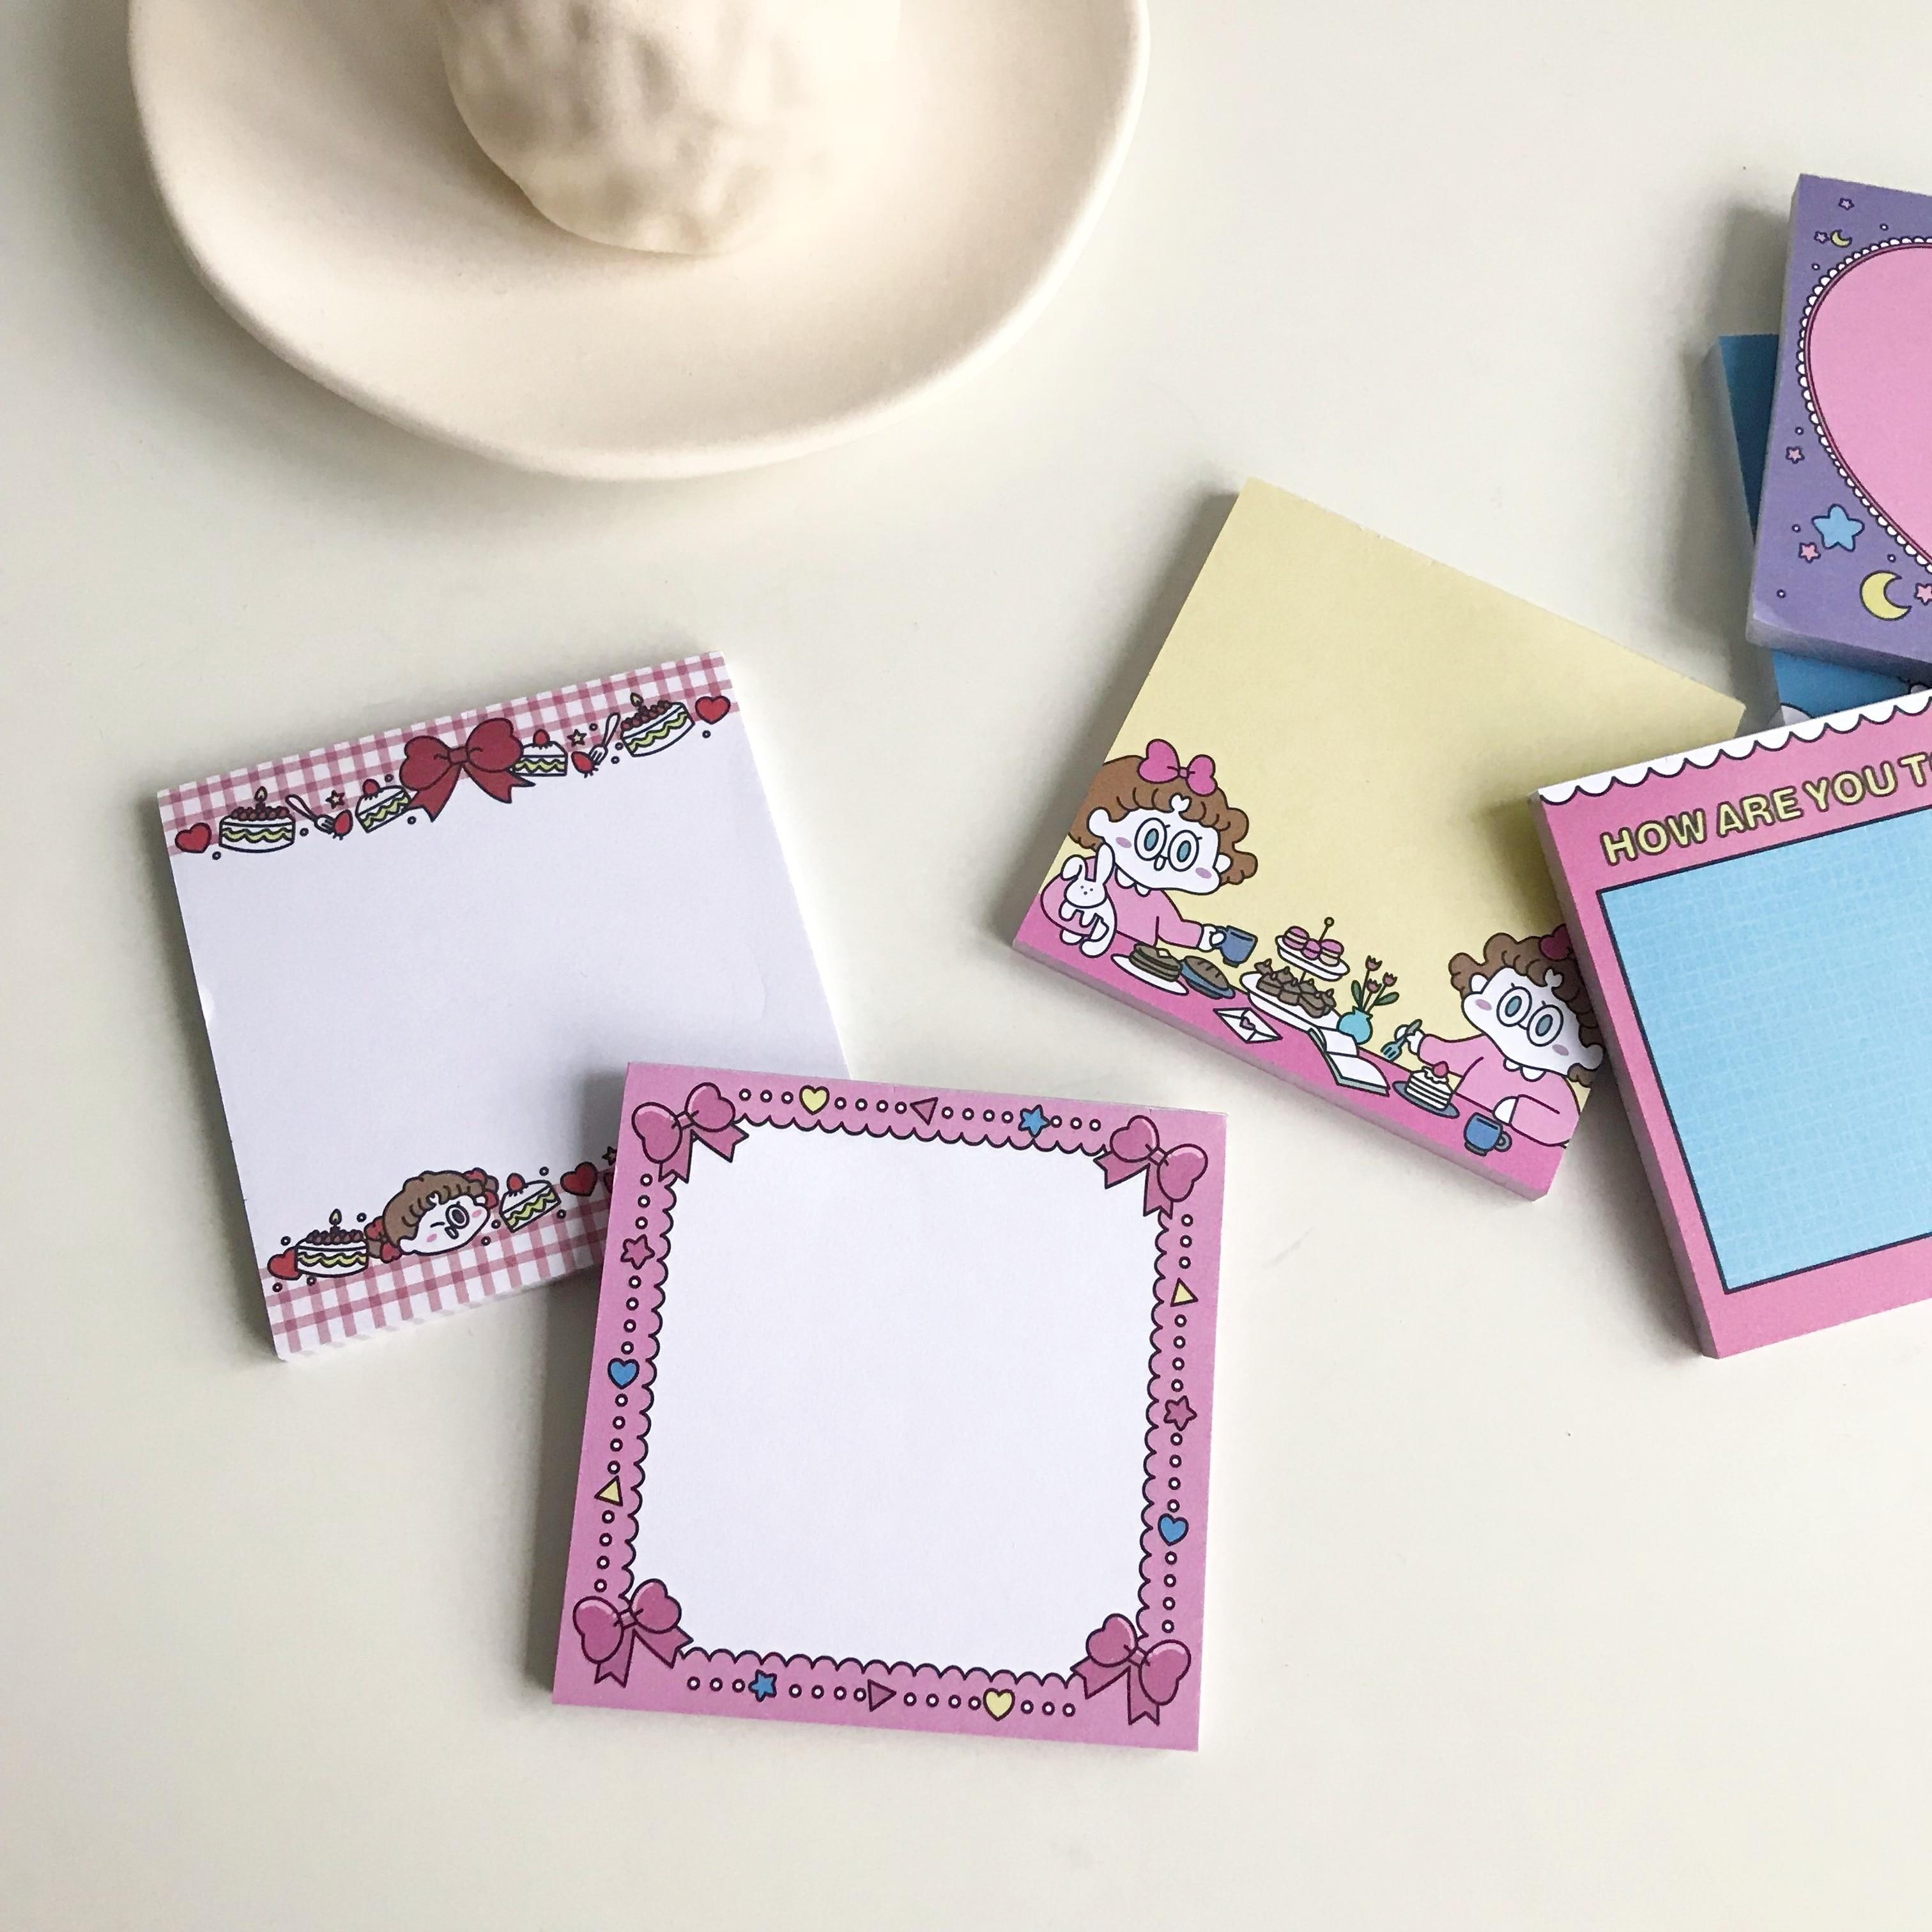 SIXONE 50 hojas de dibujos animados chica linda nota adhesiva Ins creativo cuaderno portátil bolsillo libro de palabras papelería Kawaii Bloc de notas